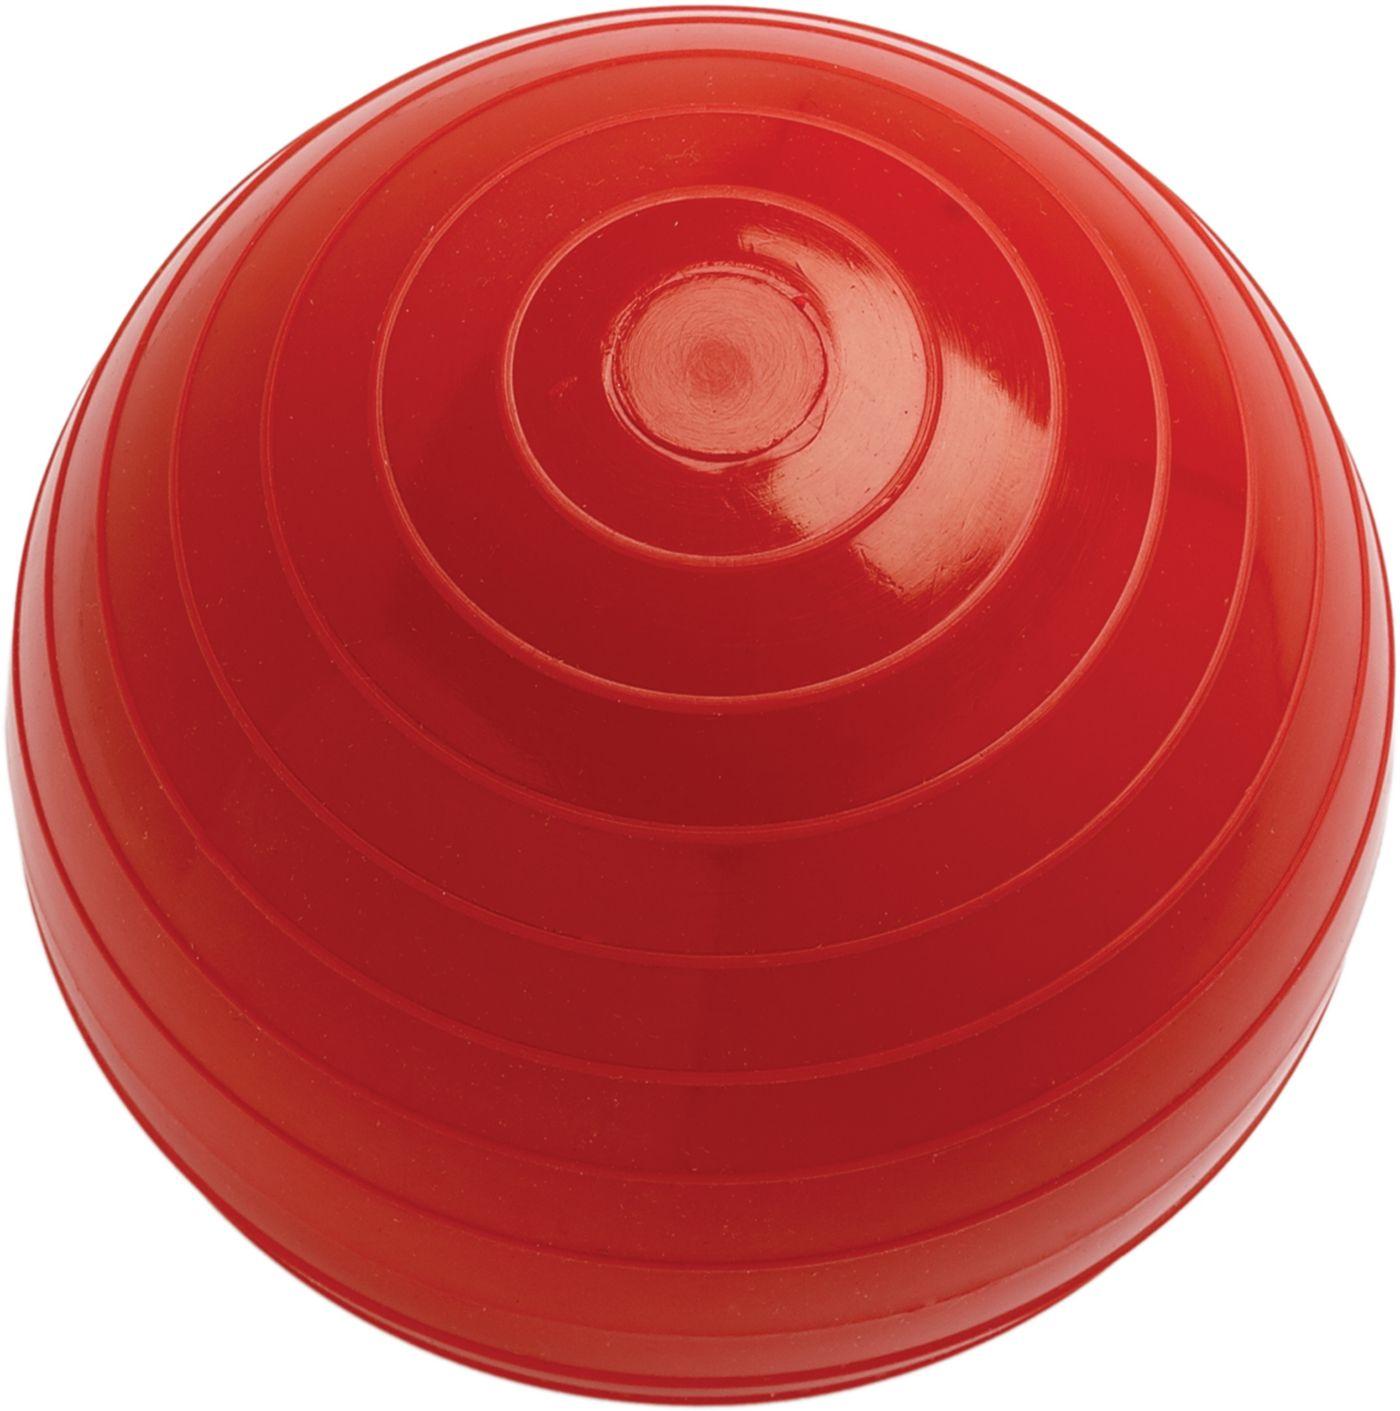 Gill 800 g Indoor Throwing Ball